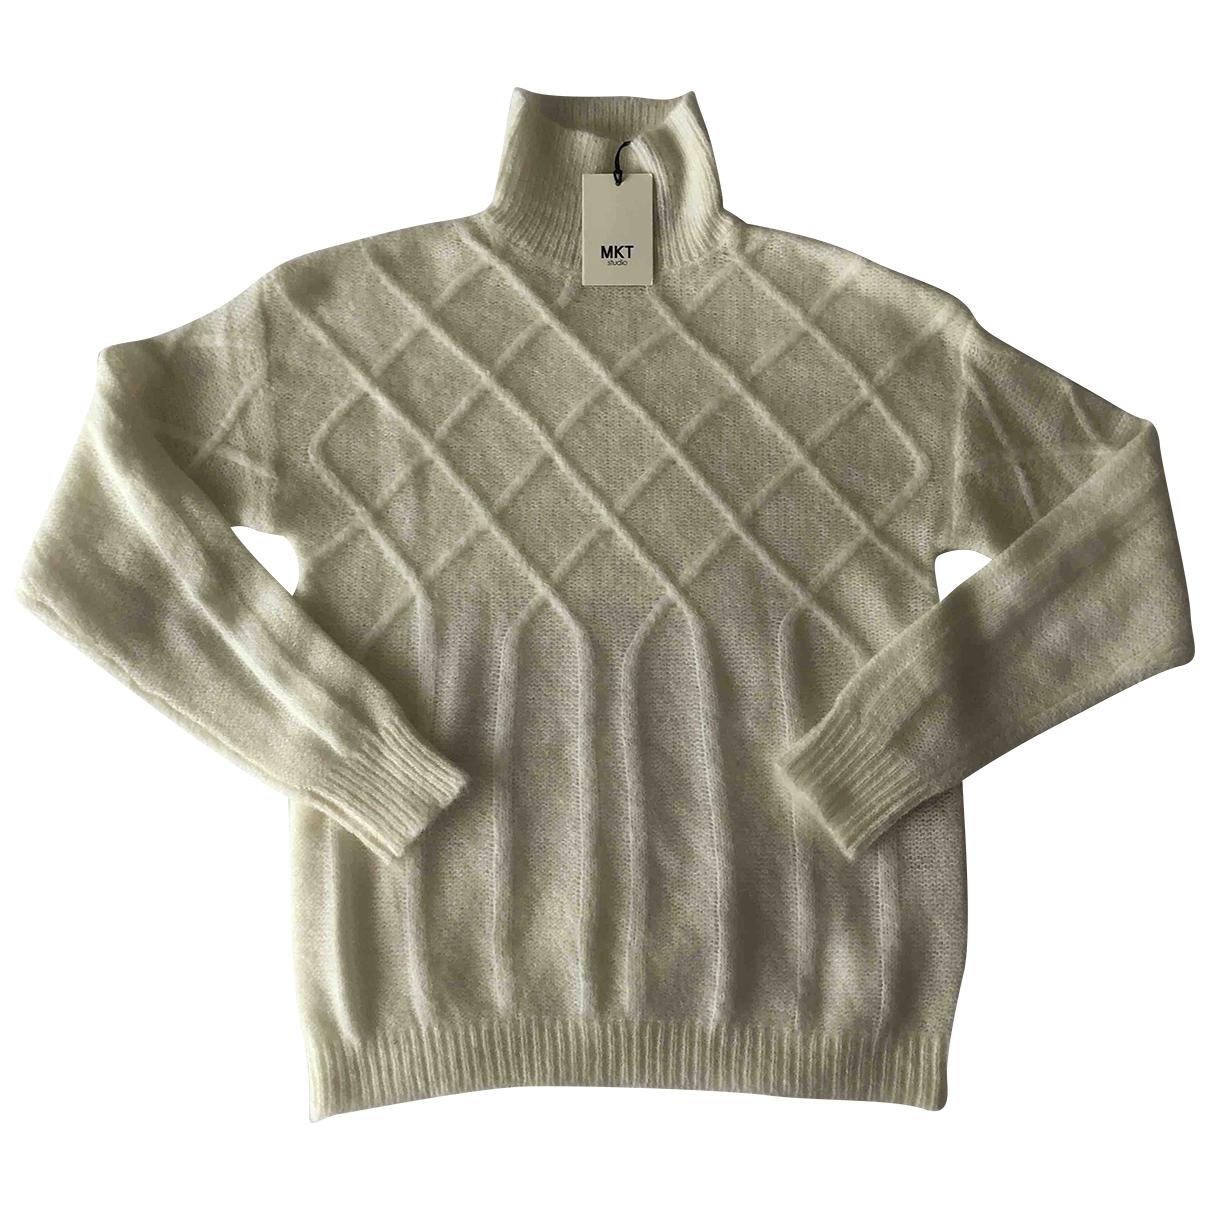 Mkt Studio - Pull   pour femme en laine - ecru